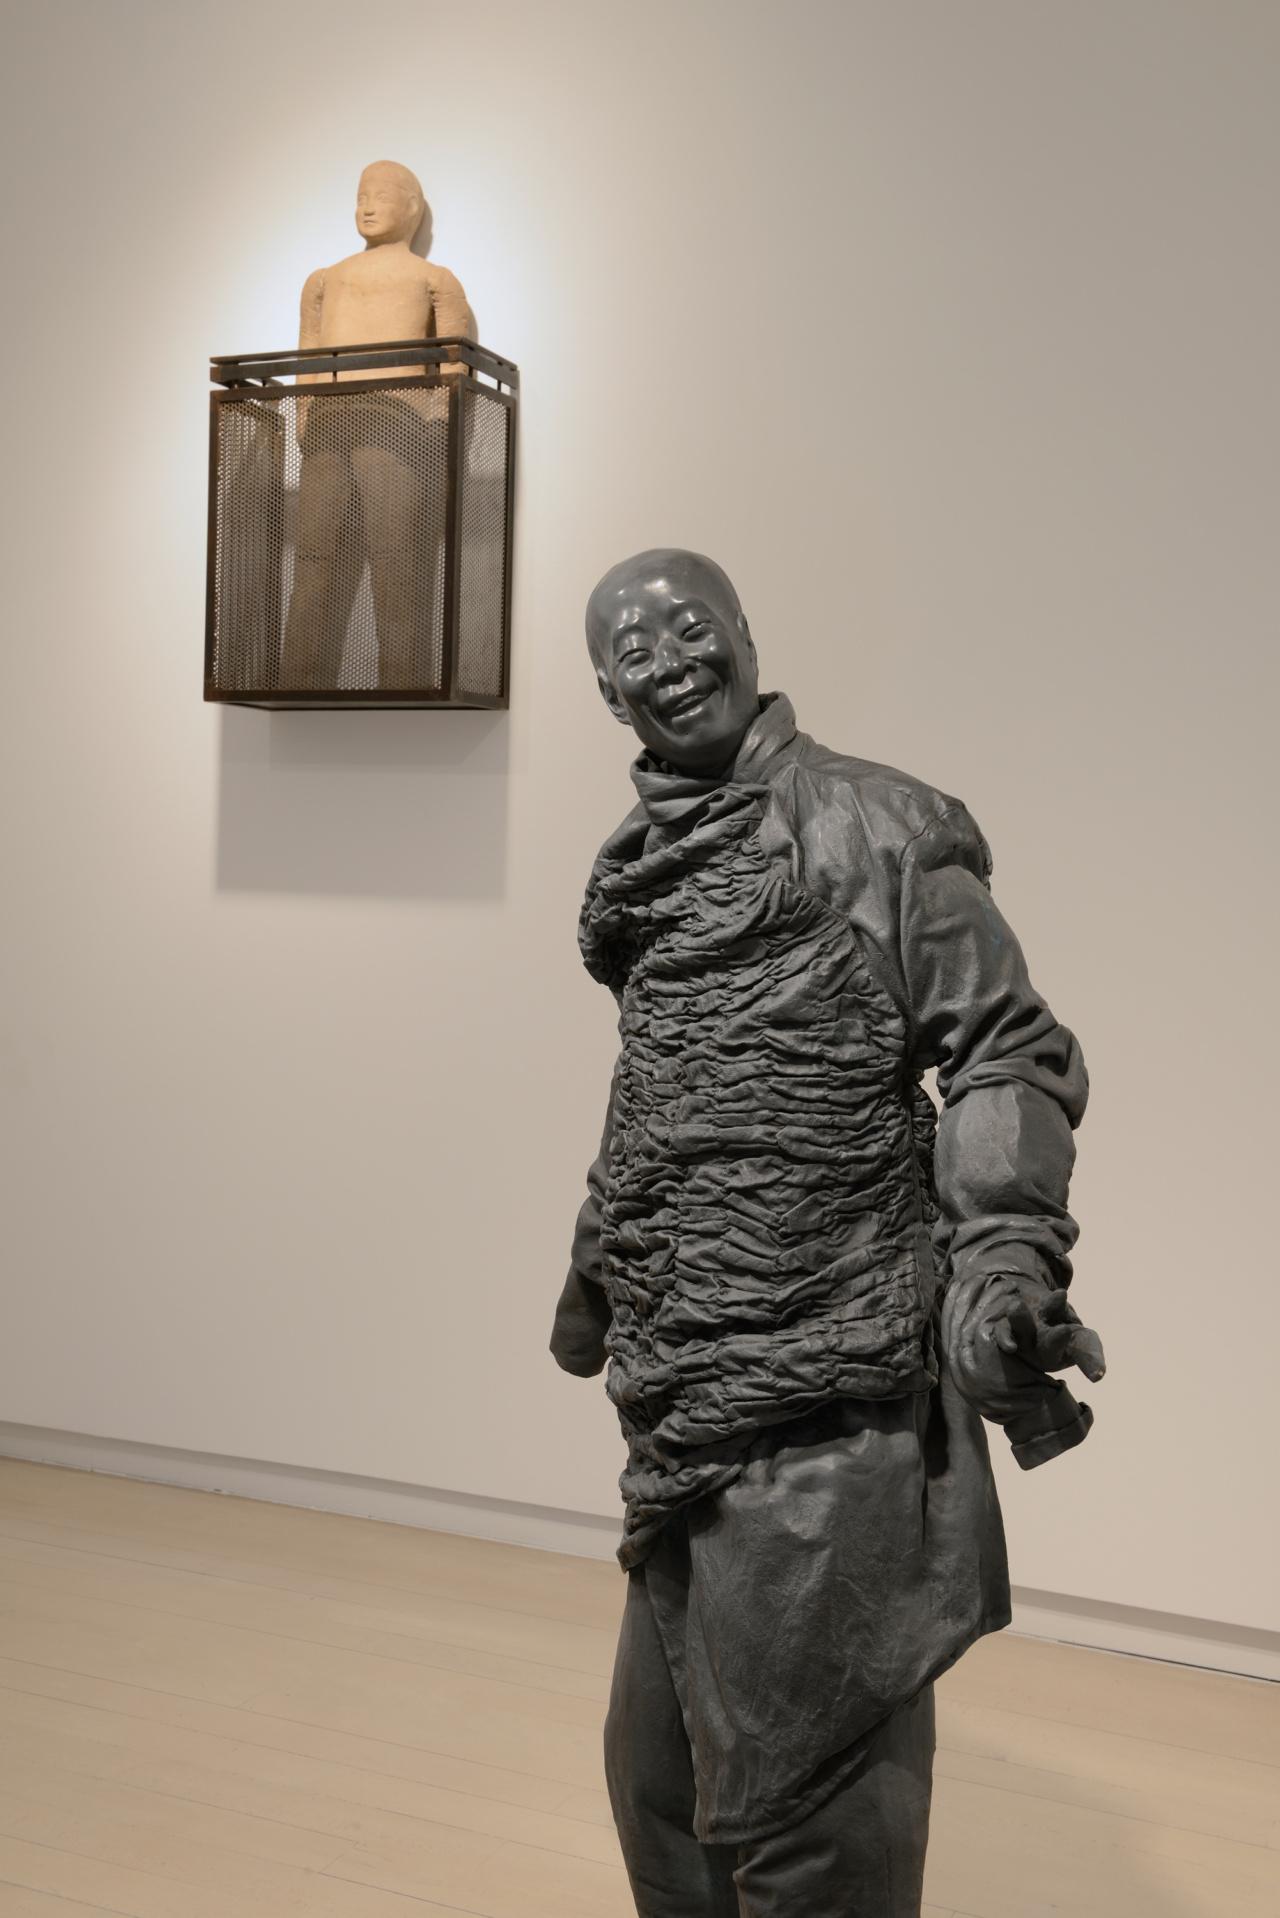 Installation view Galería Elvira González, Madrid, 2016. Courtesy Galería Elvira González. Photo Cuauhtli Gutiérrez